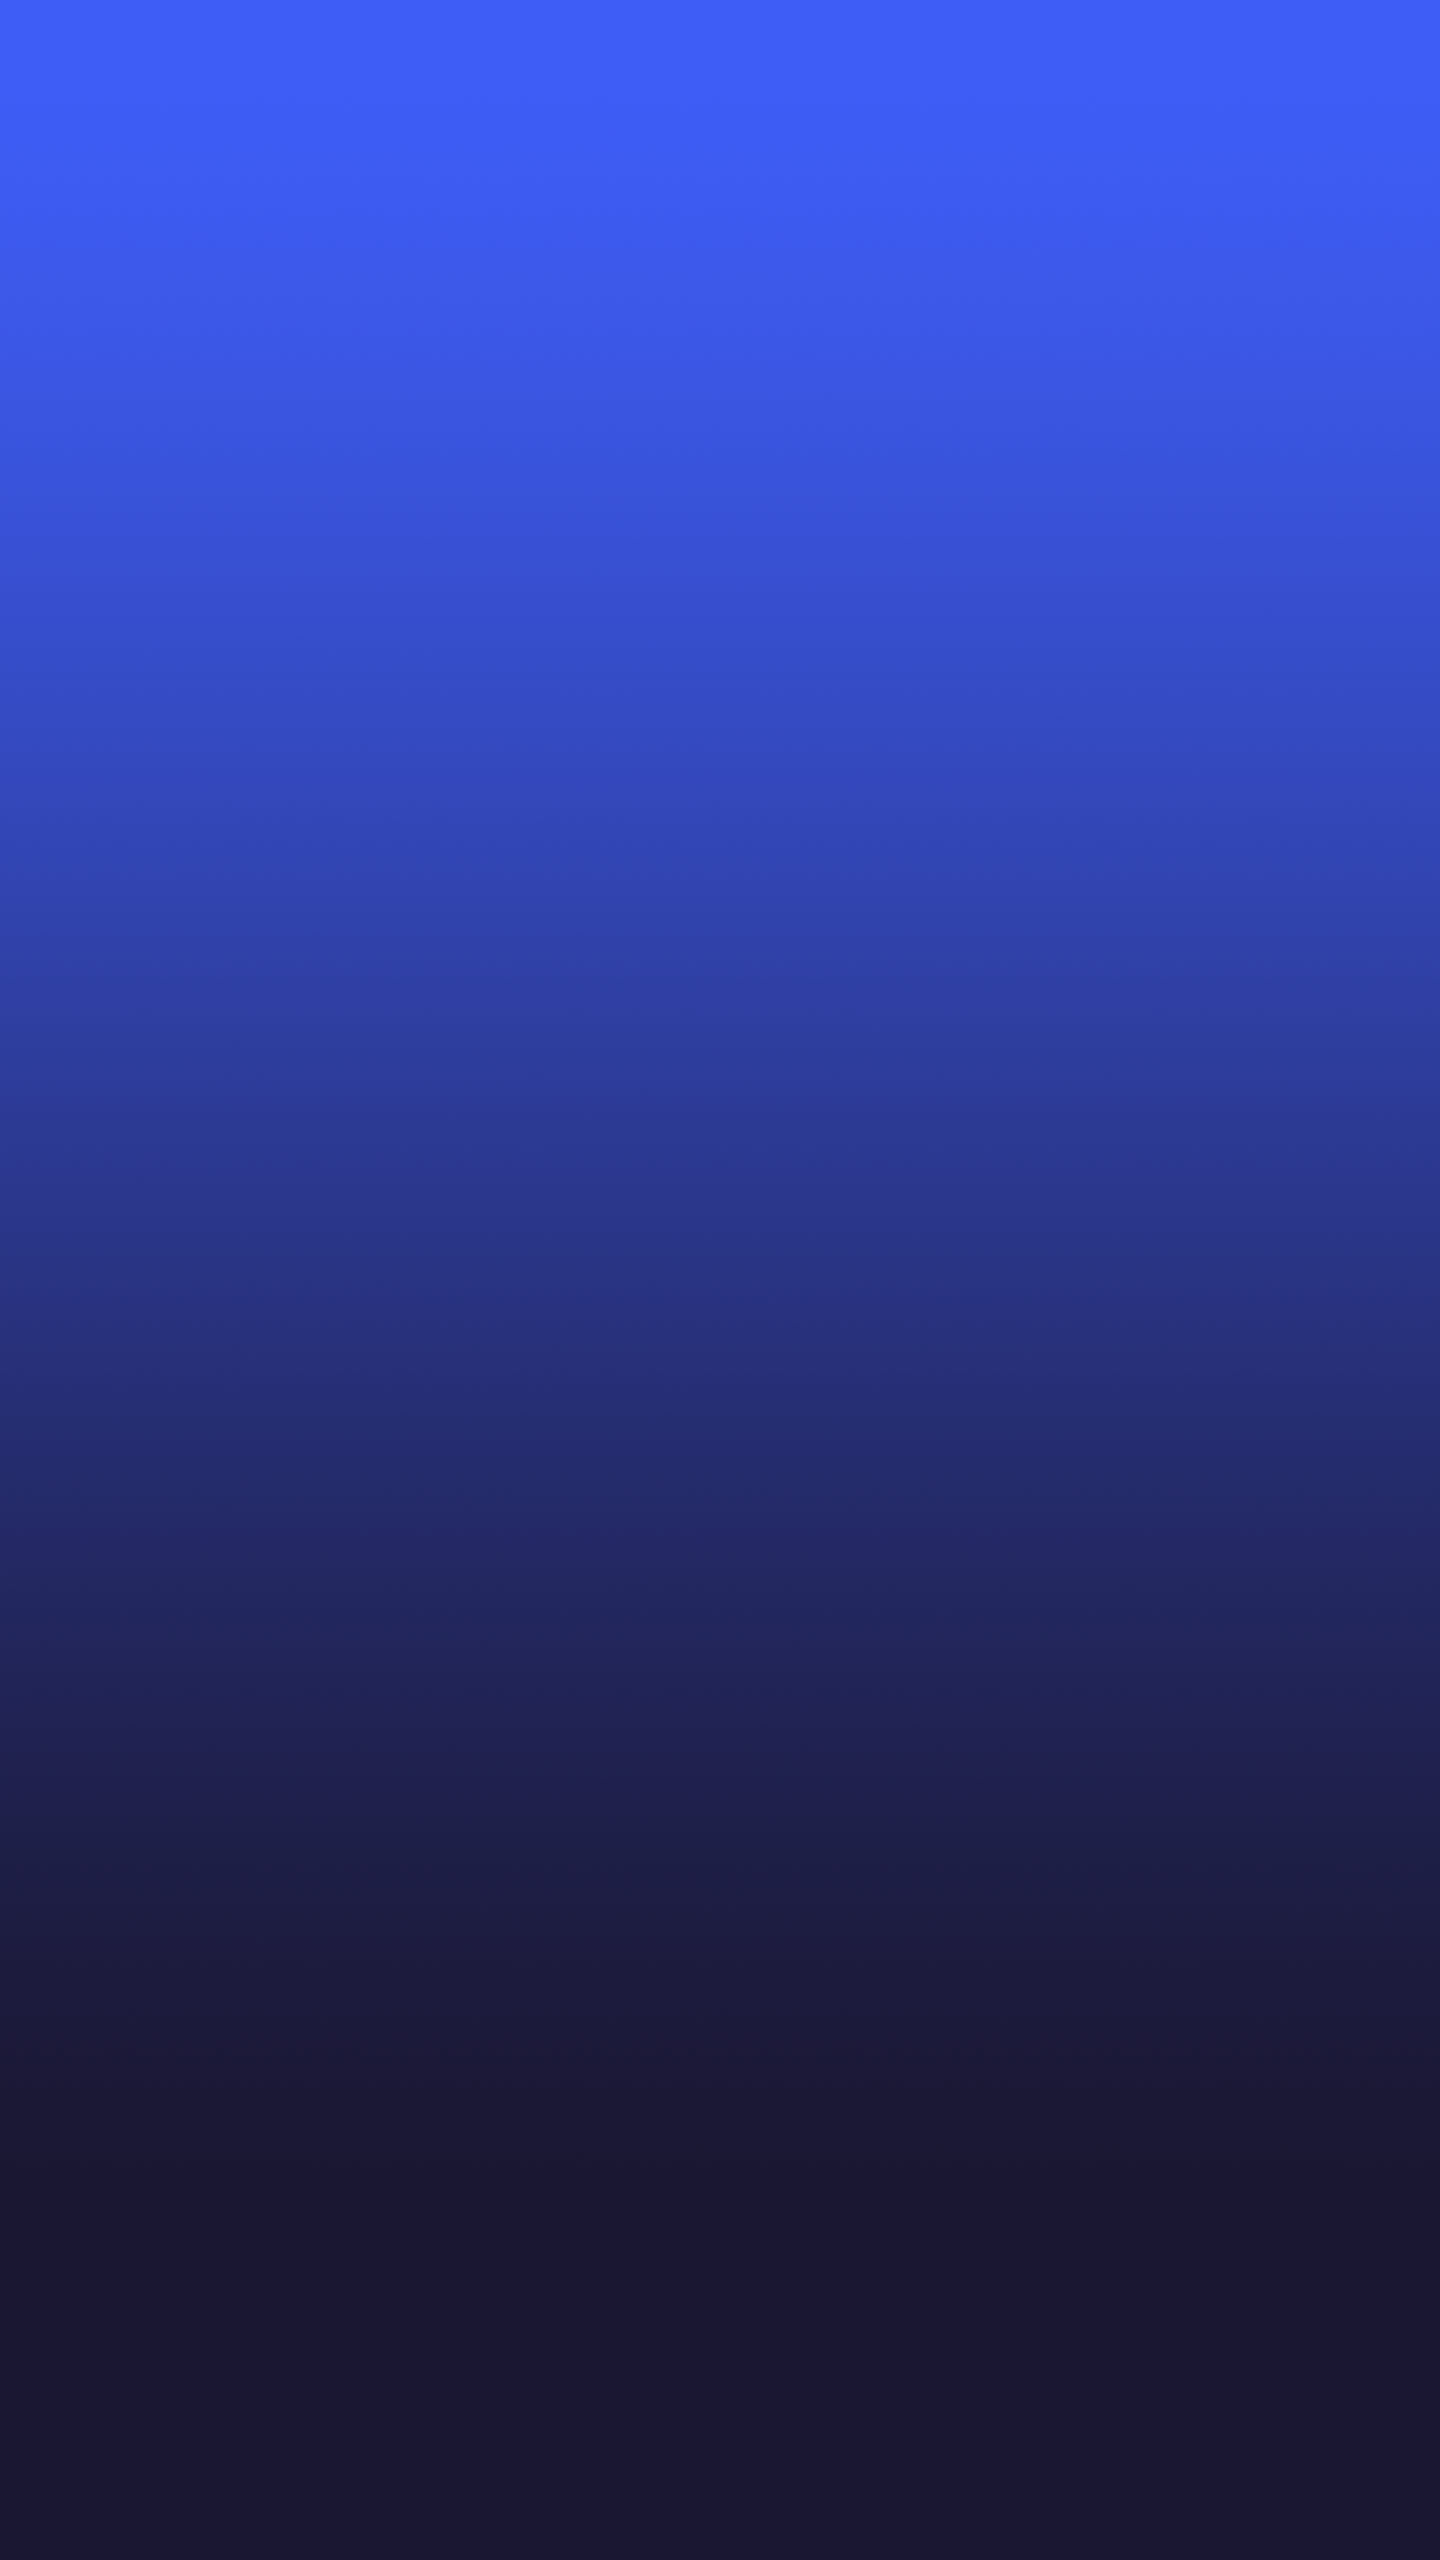 galaxy_s8_gradient